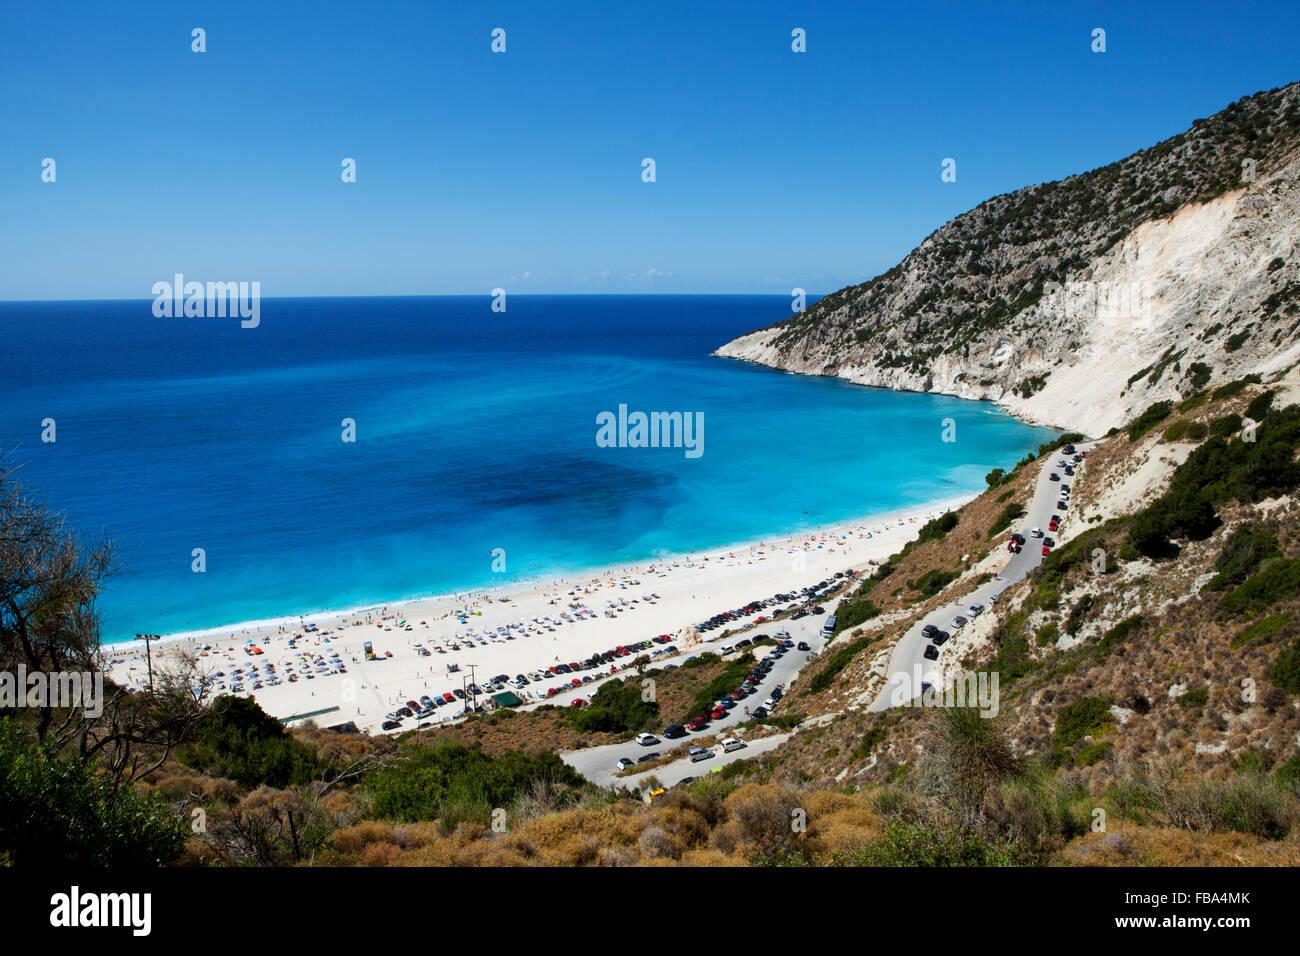 Myrtos beach, Kefalonia, Ionian Islands, Greece - Stock Image